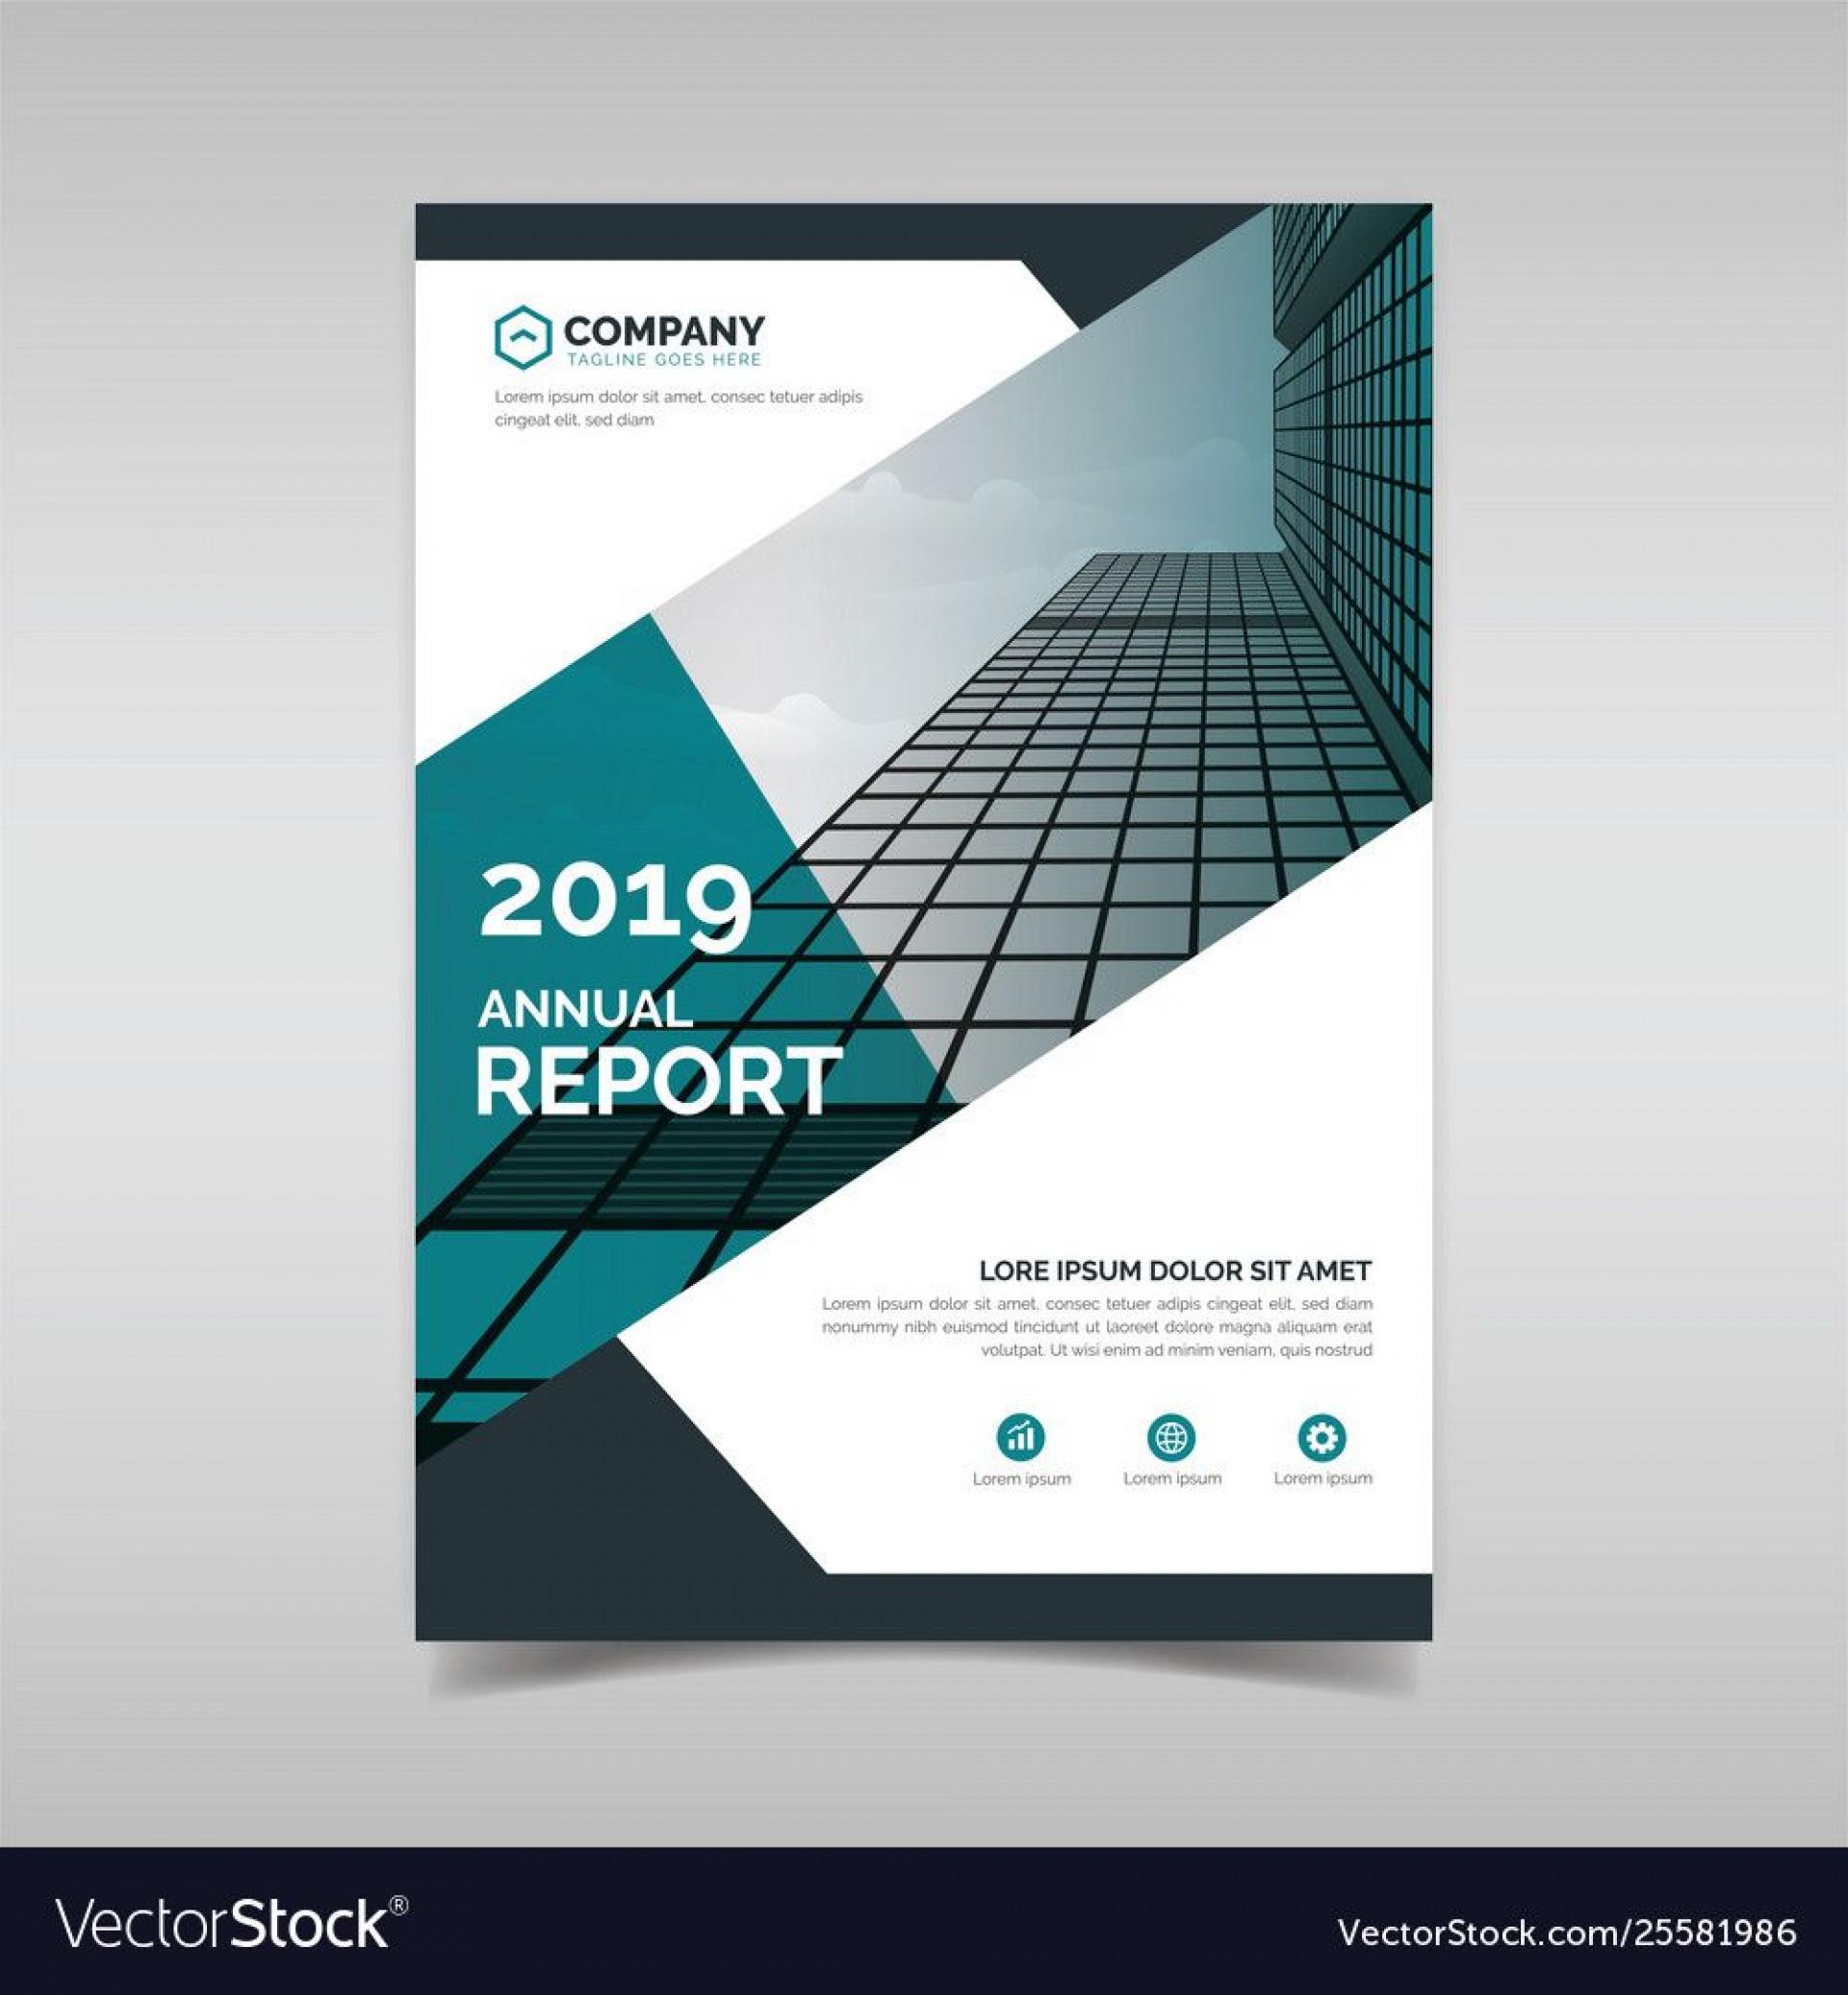 005 Shocking Book Cover Template Free Download Concept  Illustrator Design Vector Illustration1920